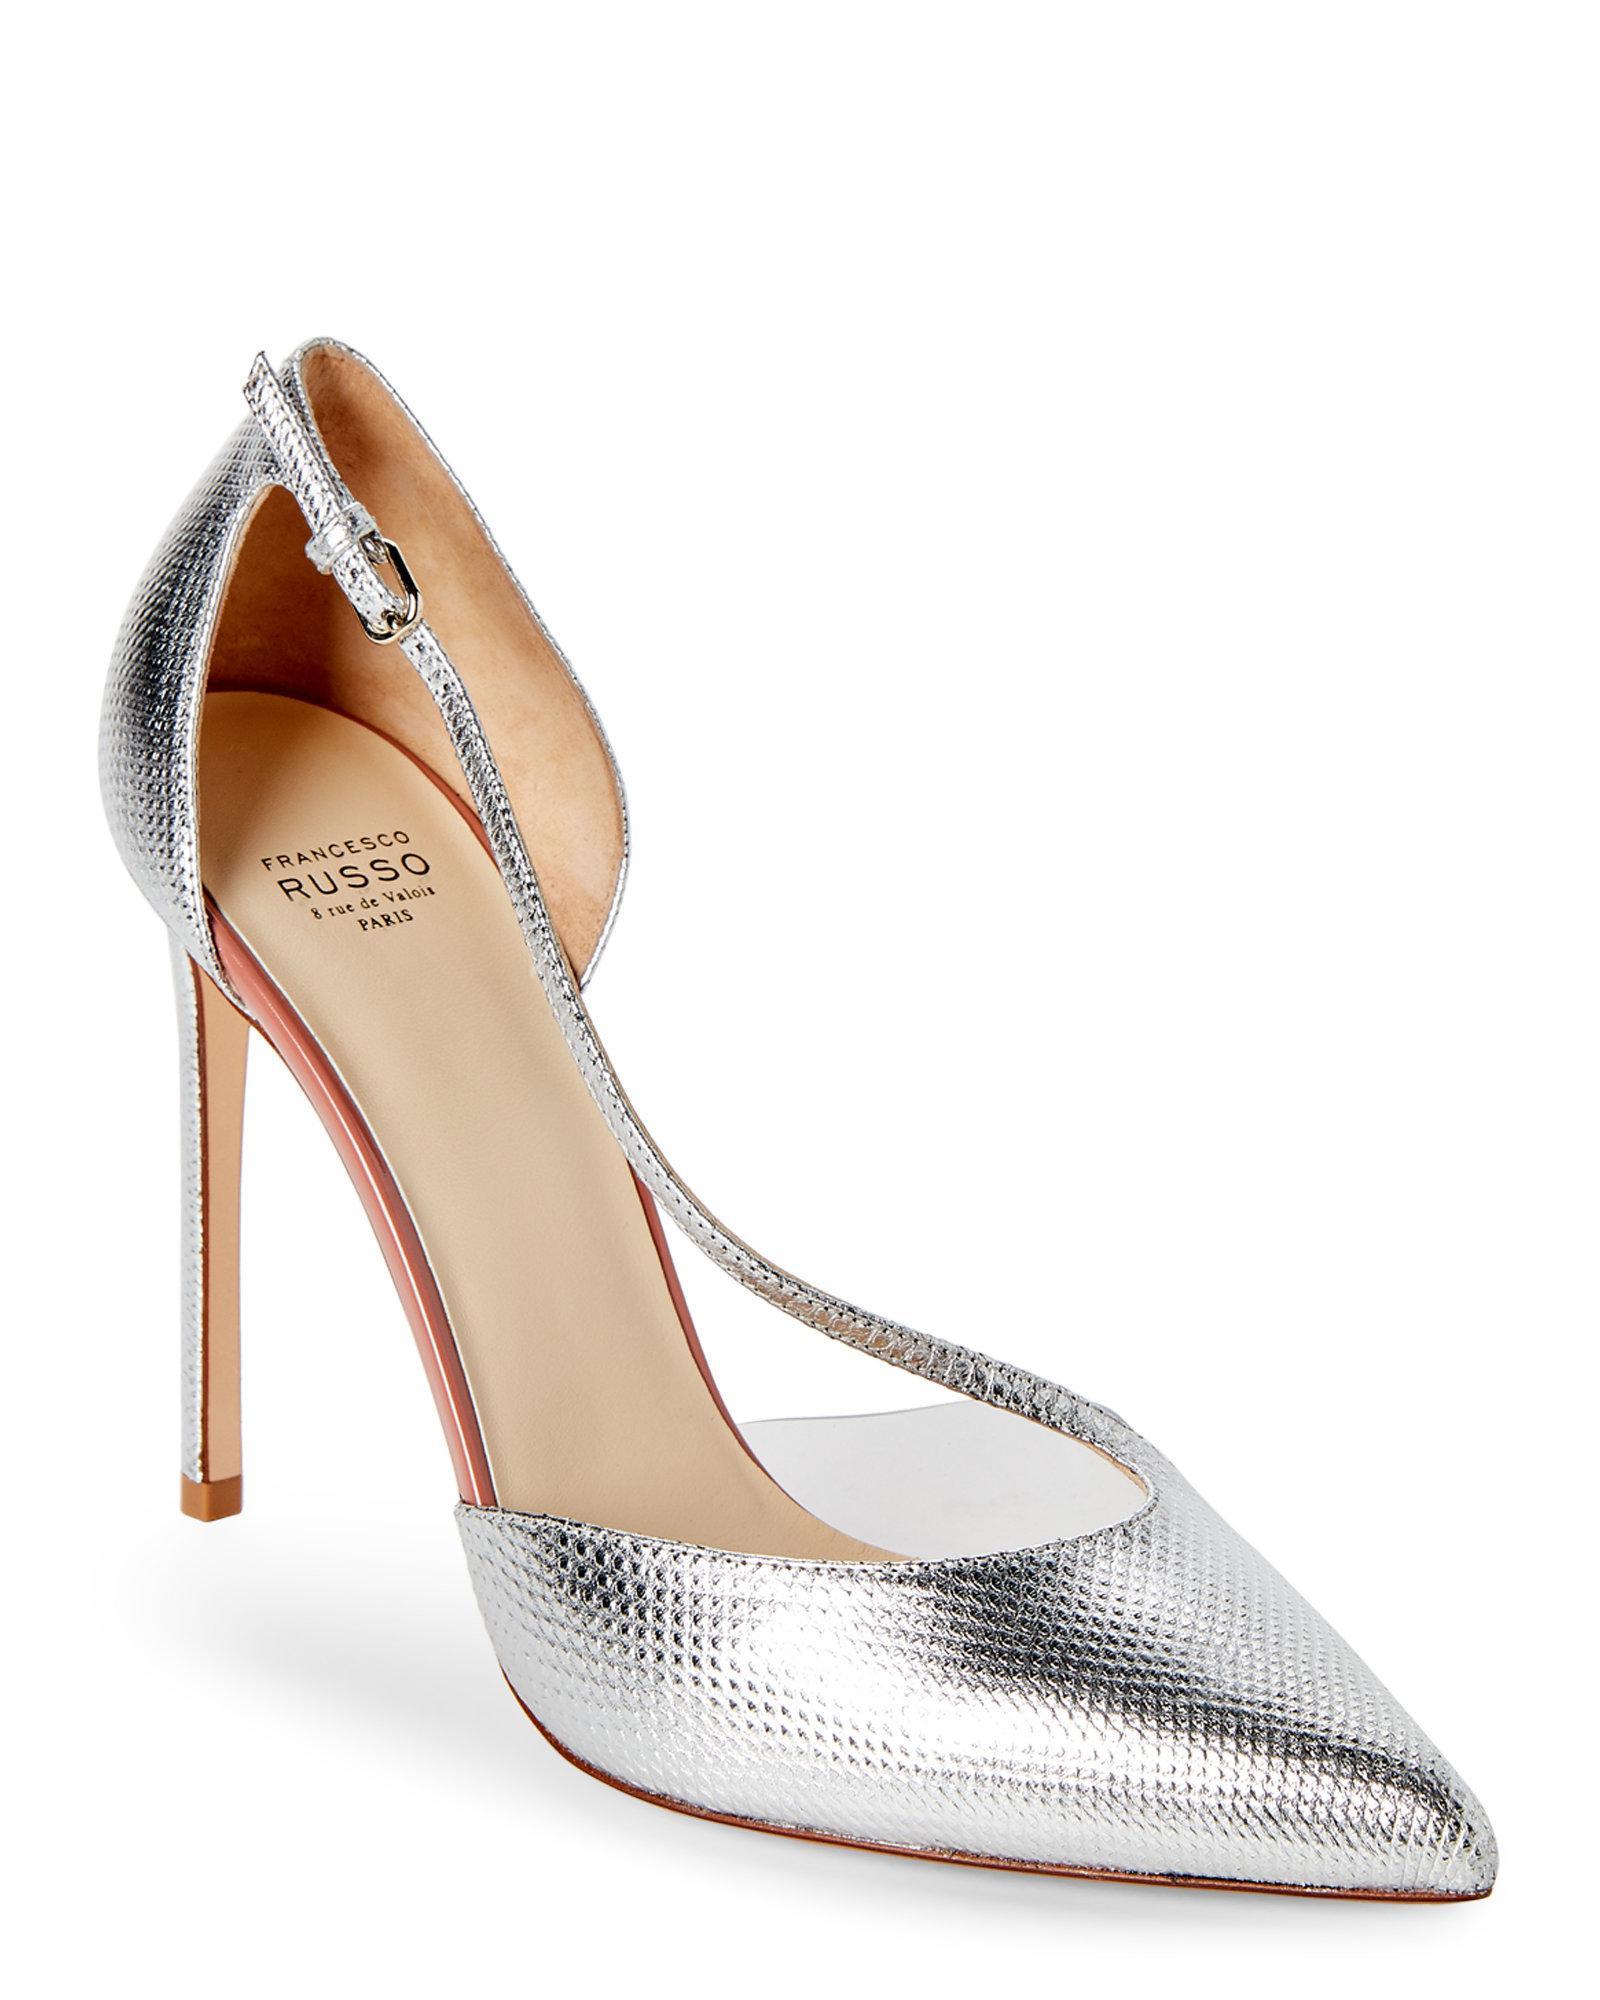 b08ba3e3975 Lyst - Francesco Russo Silver D orsay Pointed Toe Pumps in Metallic